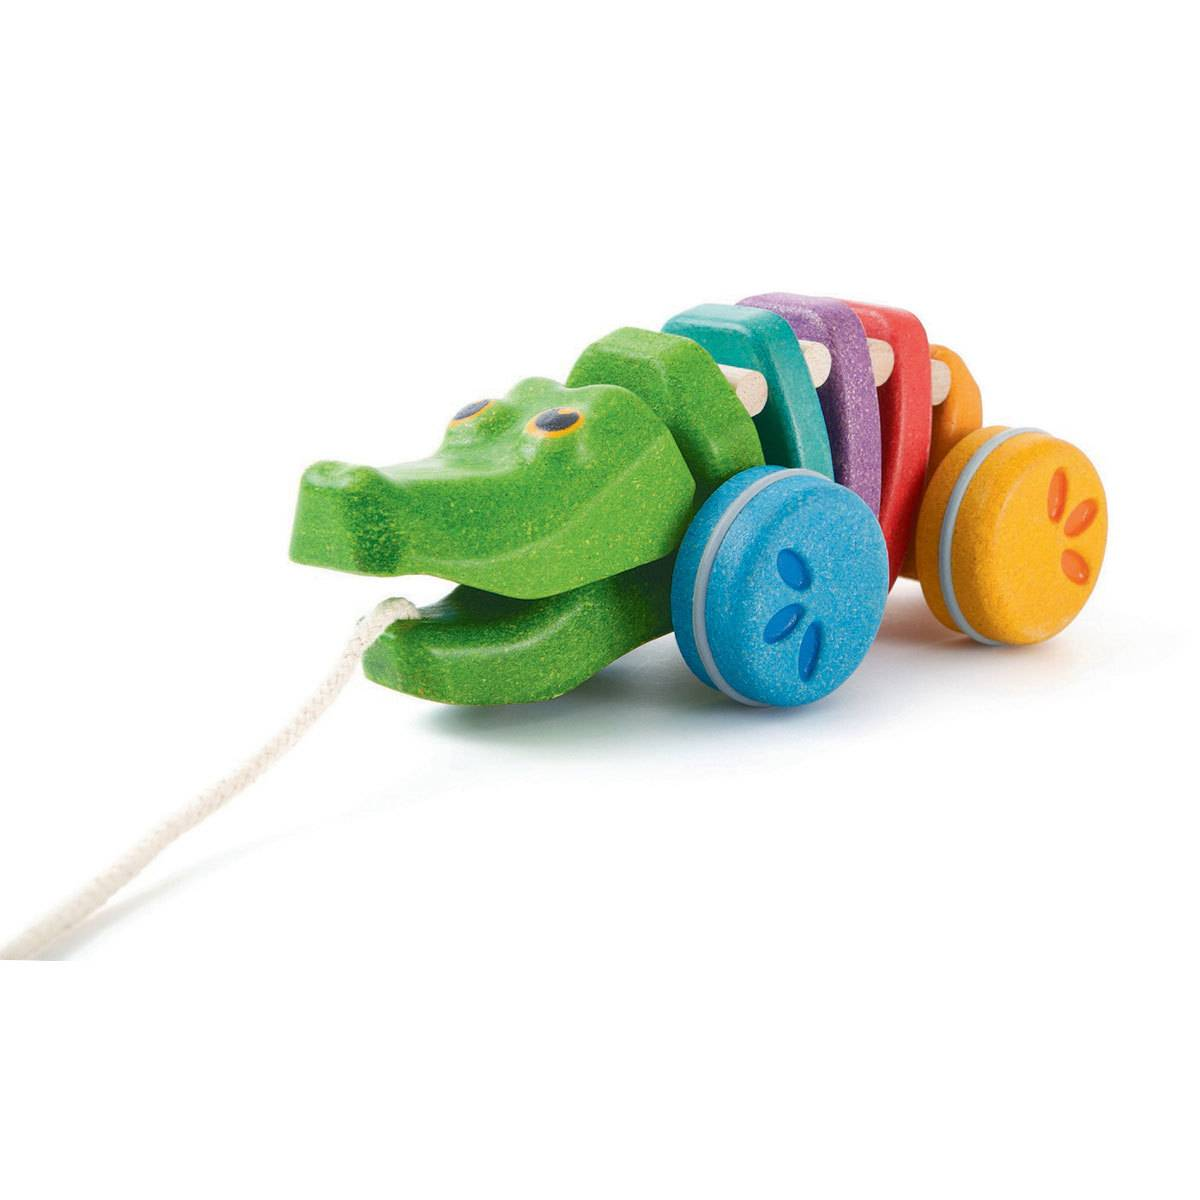 Plan Toys Alligator Arc-En-Ciel